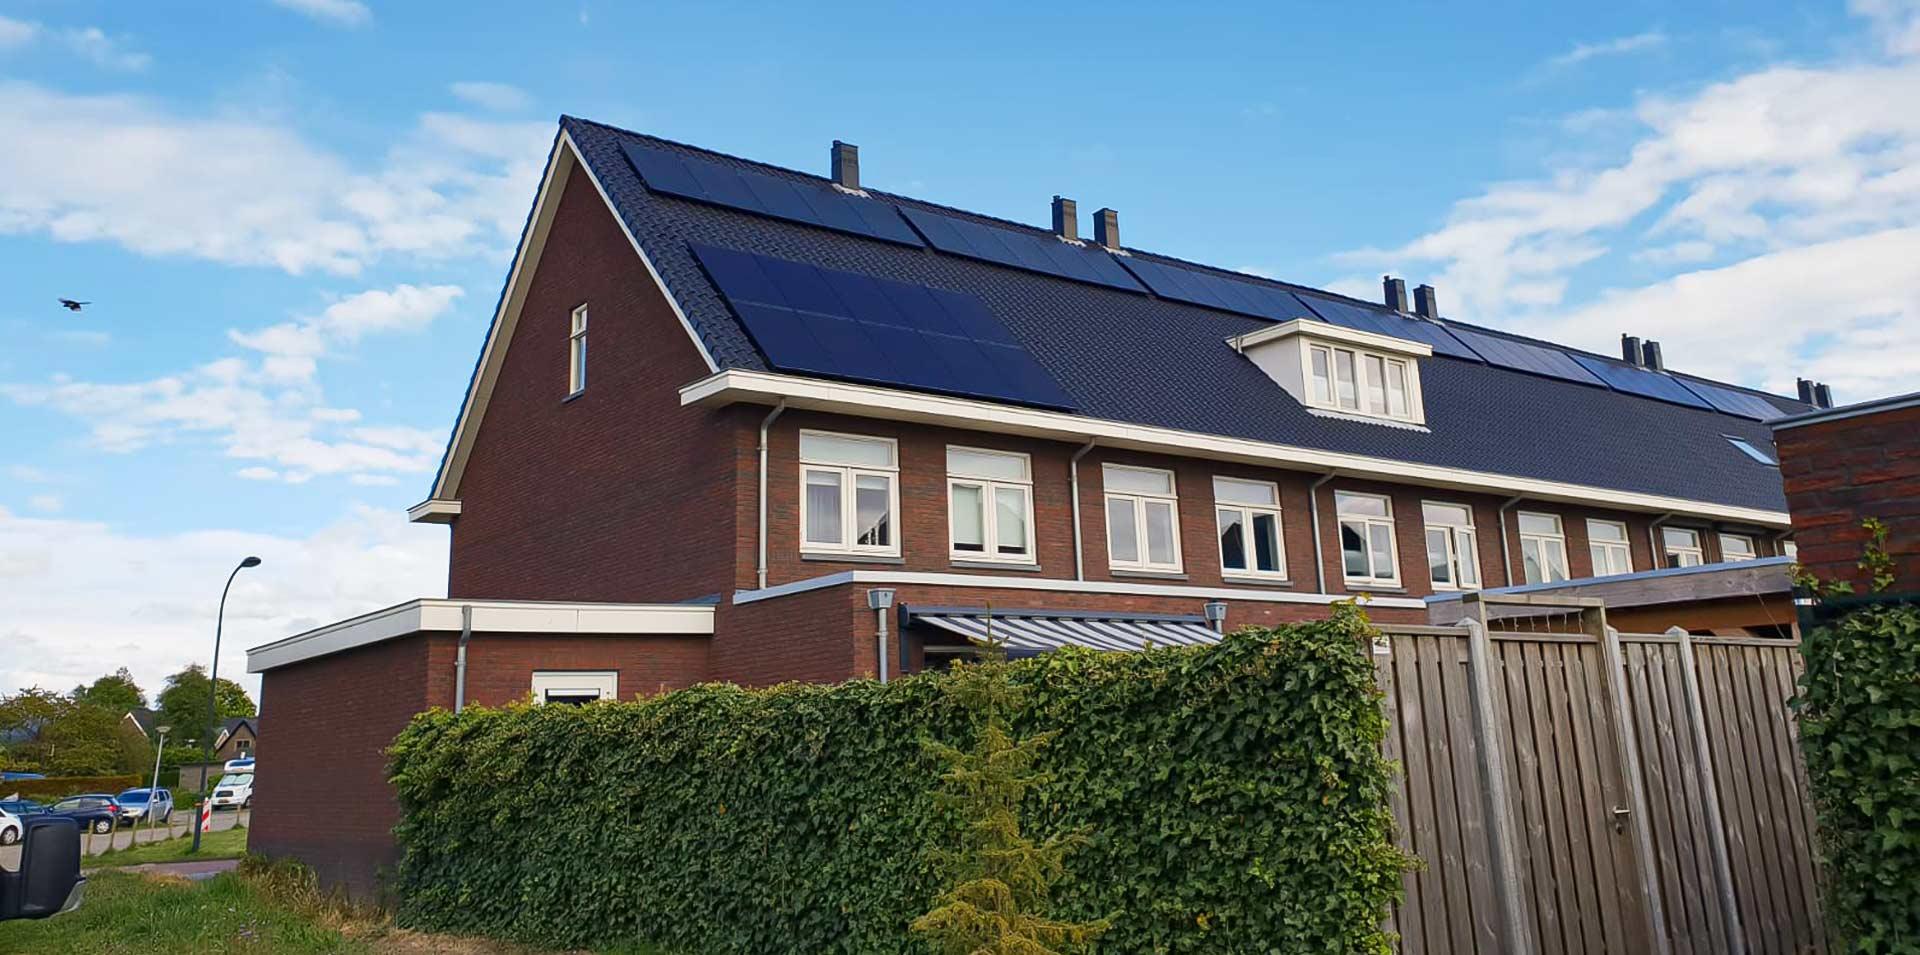 Zonnepanelen installateur noord-holland - Zonnepanelen op daken huizen - Multi energy solutions